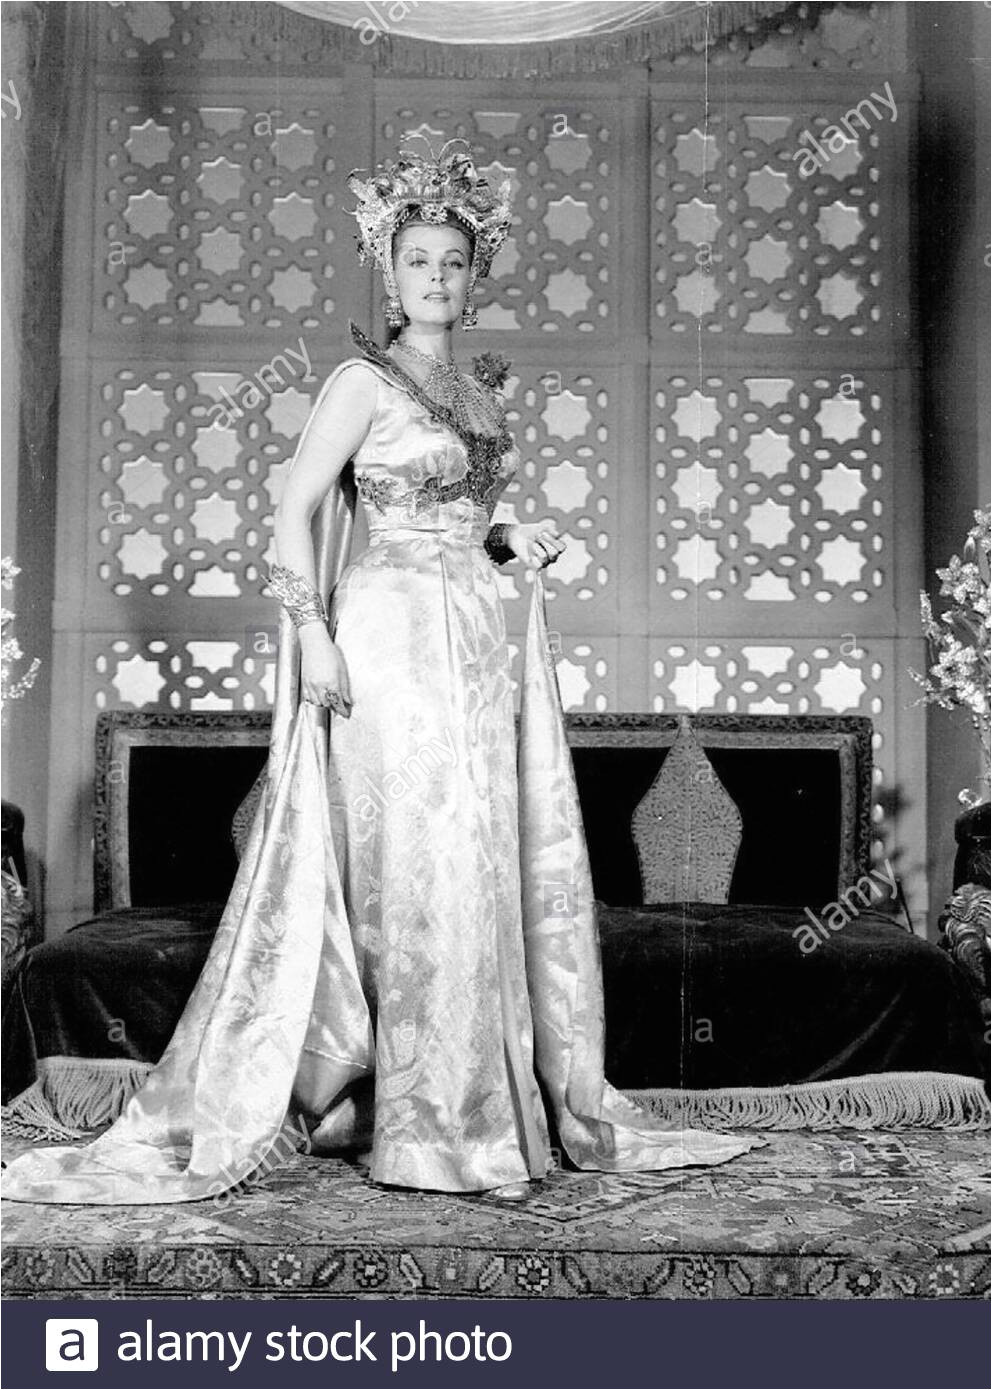 diamond queen 1953 warner bros film with arlene dahl 2atw169 jpg